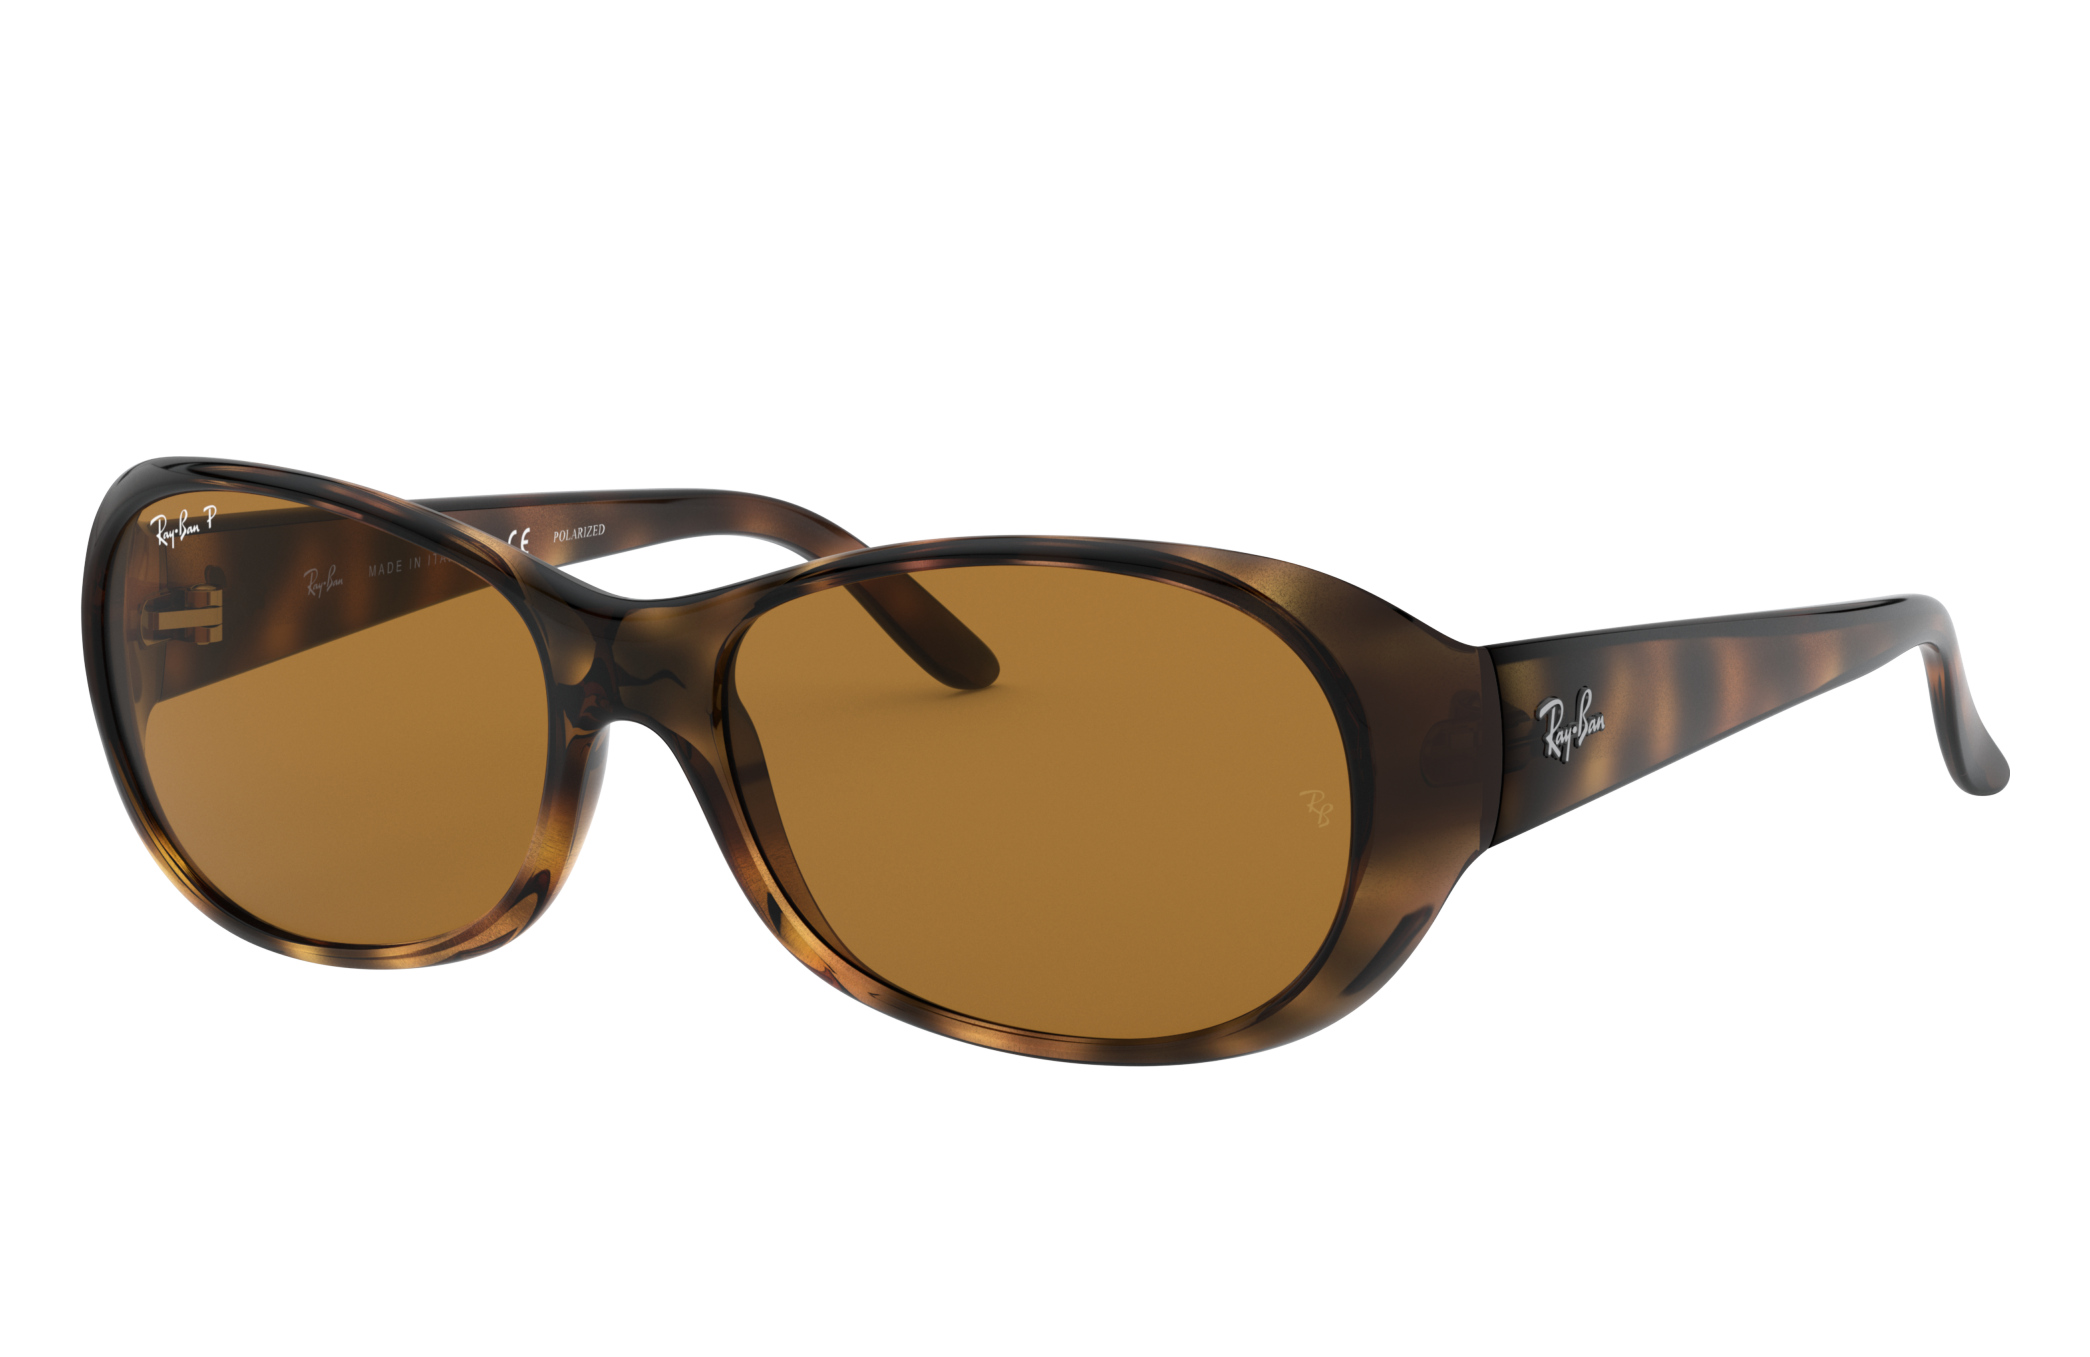 Ray-Ban Rb4061 Tortoise, Polarized Brown Lenses - RB4061